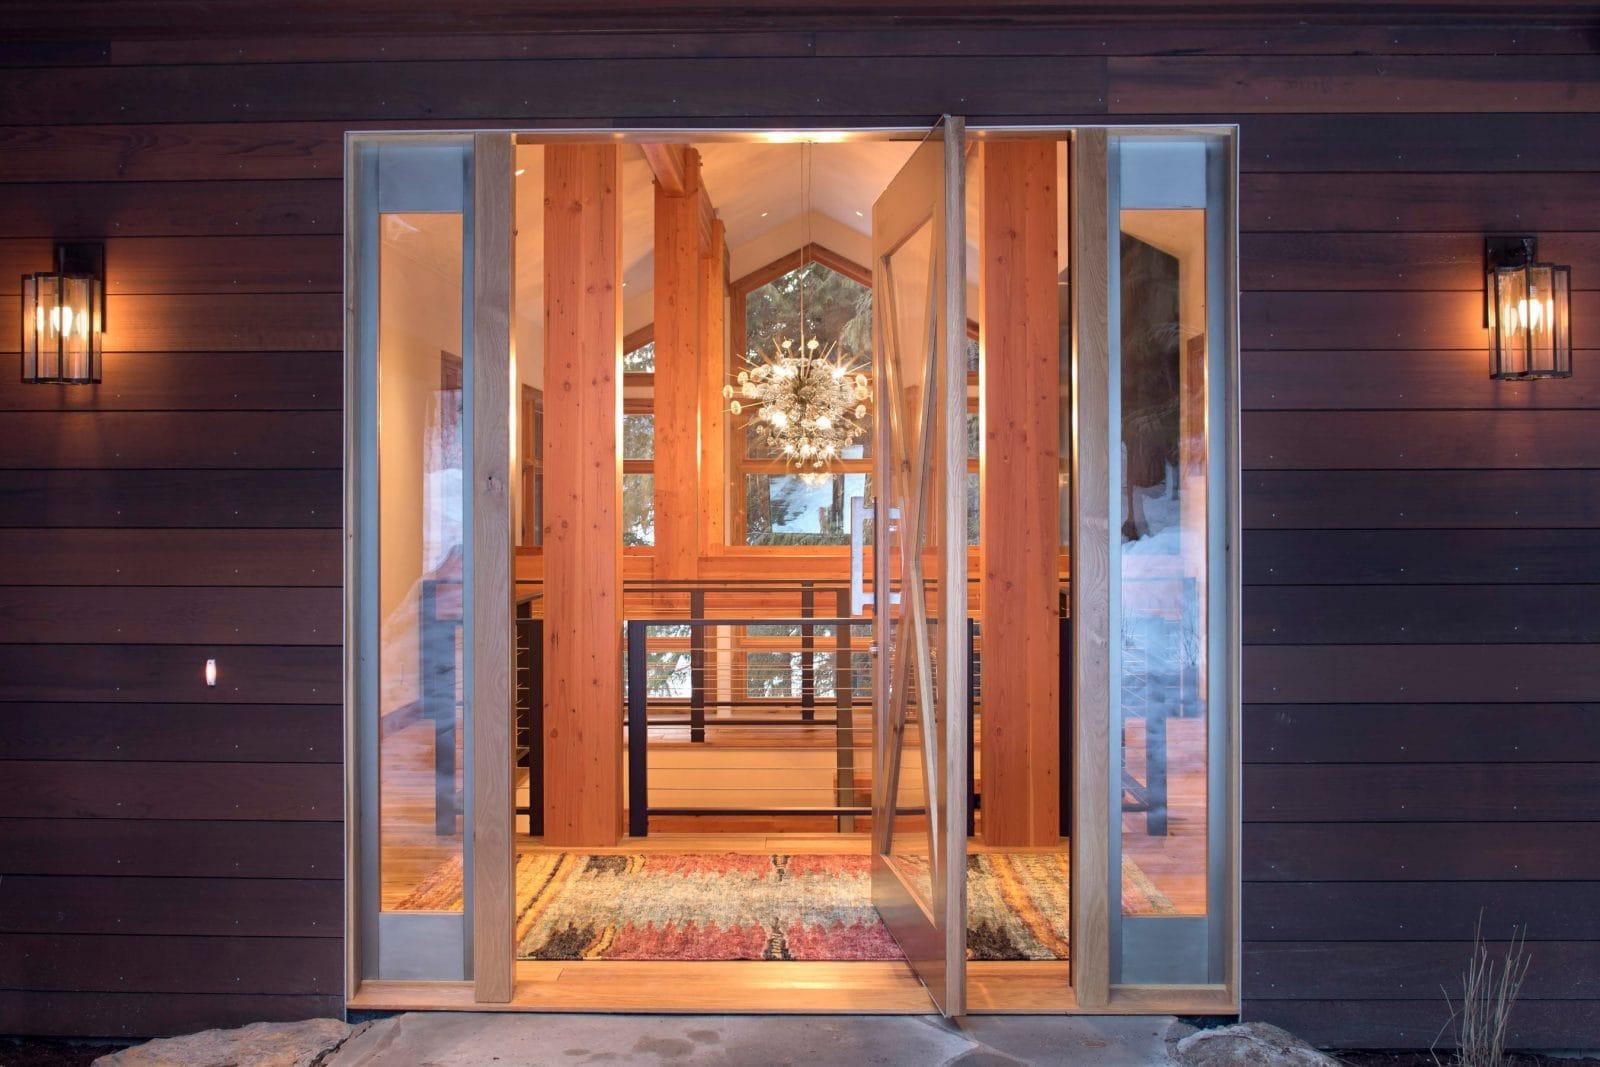 Indigo lake House Pivot door designed by Michael Donohue NCARB